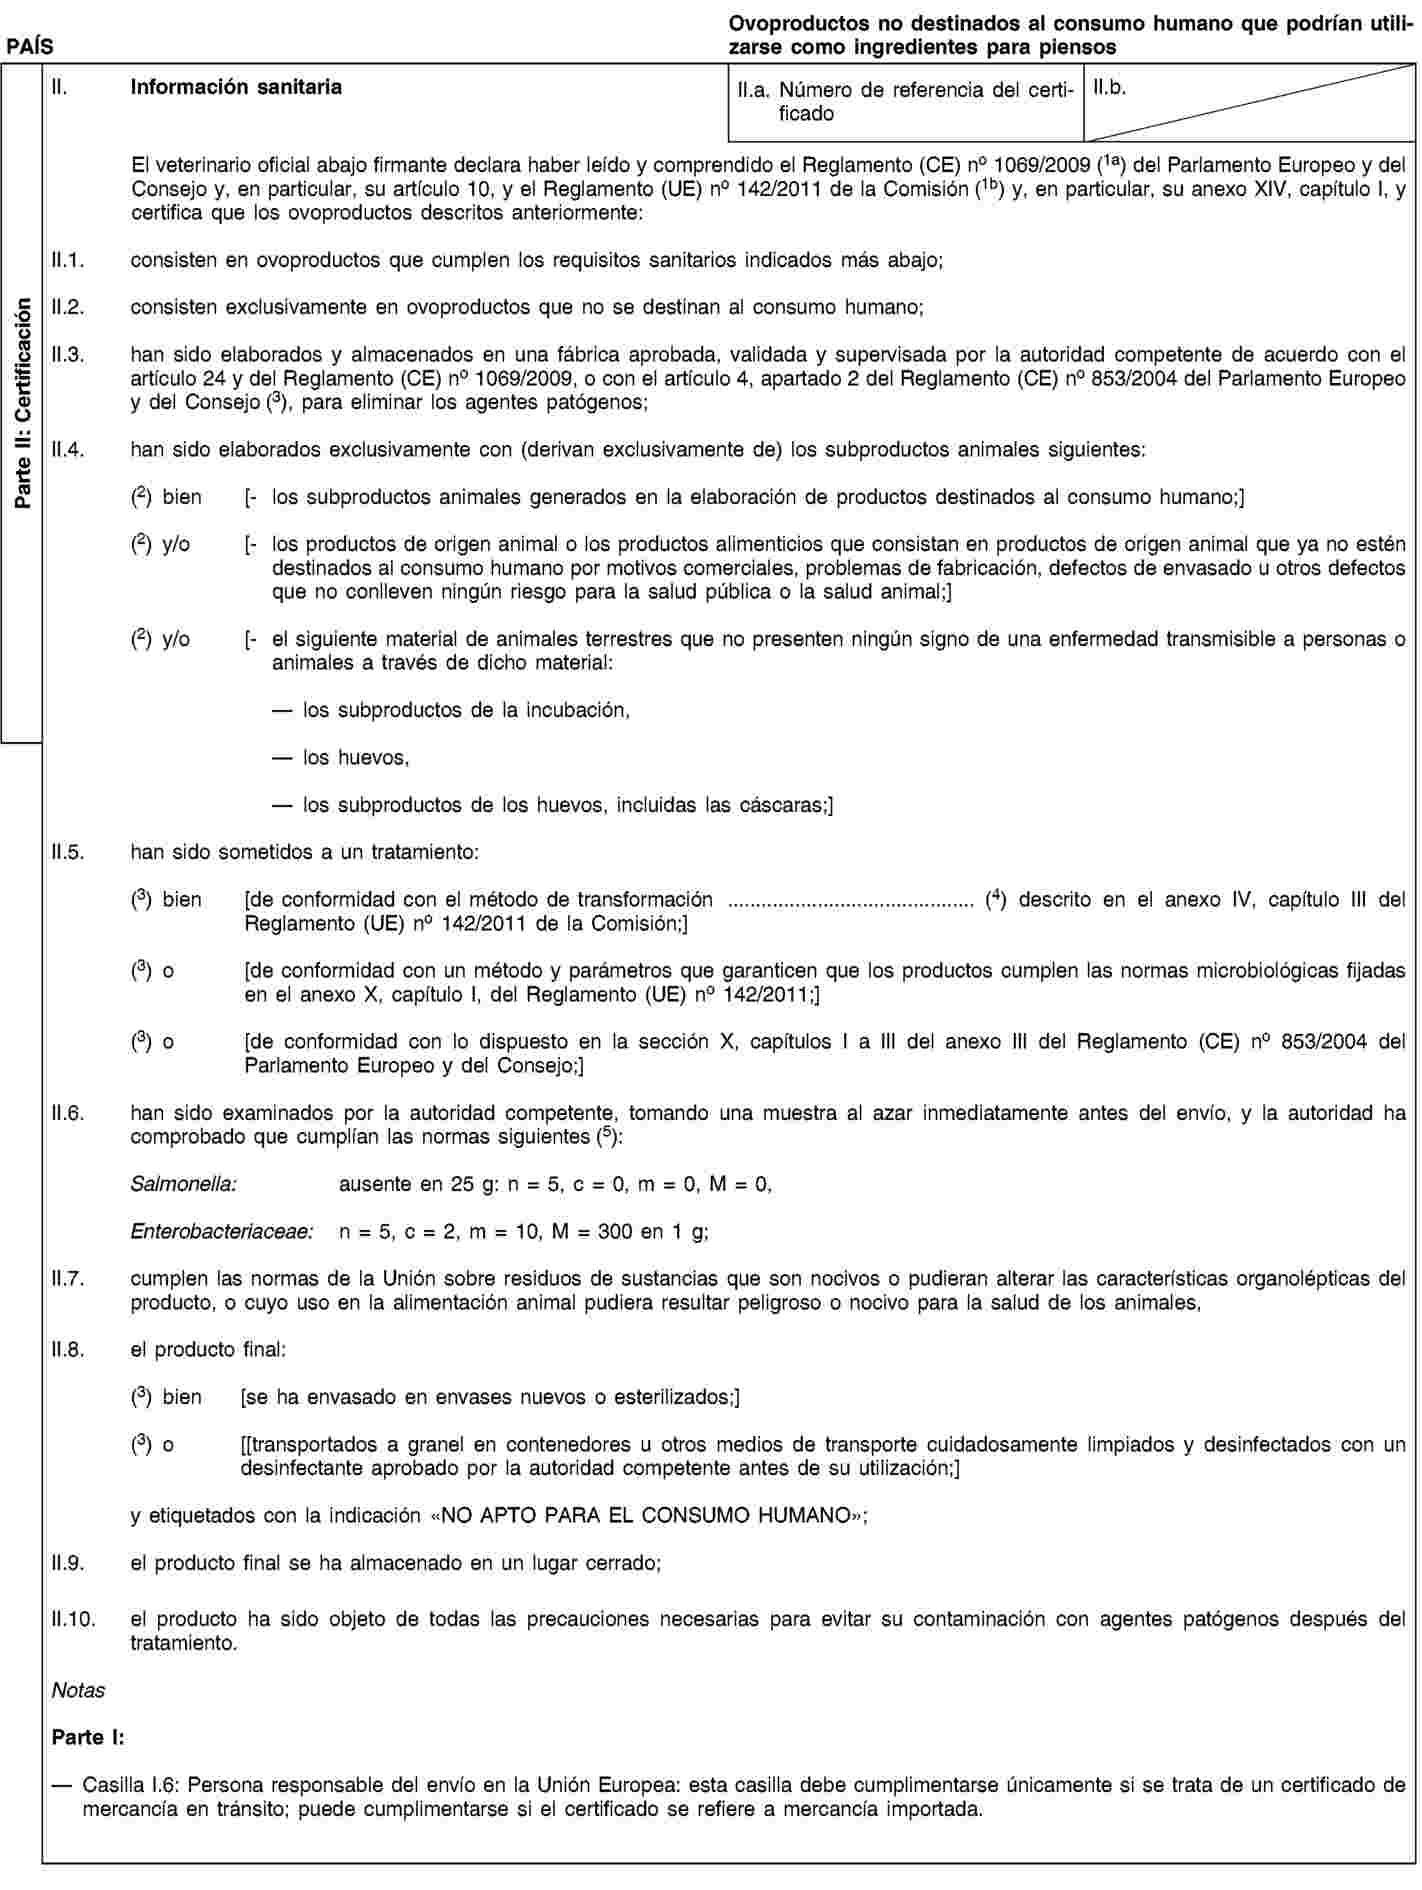 Imagen: https://eur-lex.europa.eu/resource.html?uri=uriserv:OJ.L_.2011.054.01.0001.01.SPA.xhtml.L_2011054ES.01023301.tif.jpg